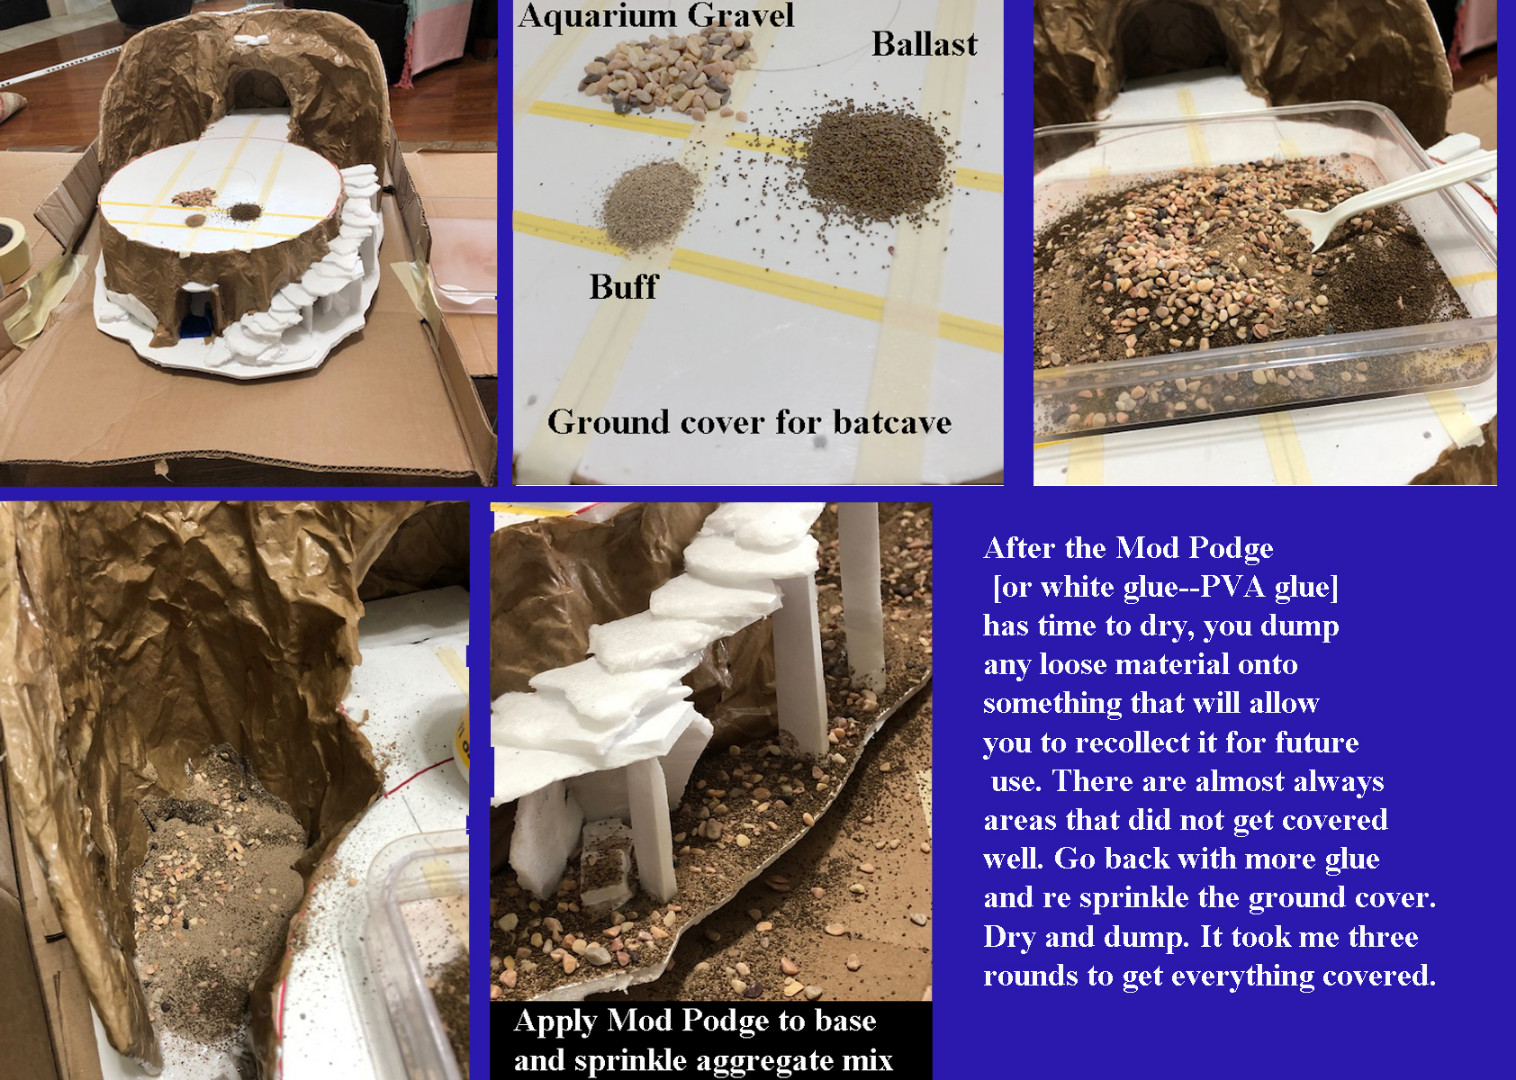 batcave ground cover 07 30 2019.jpg